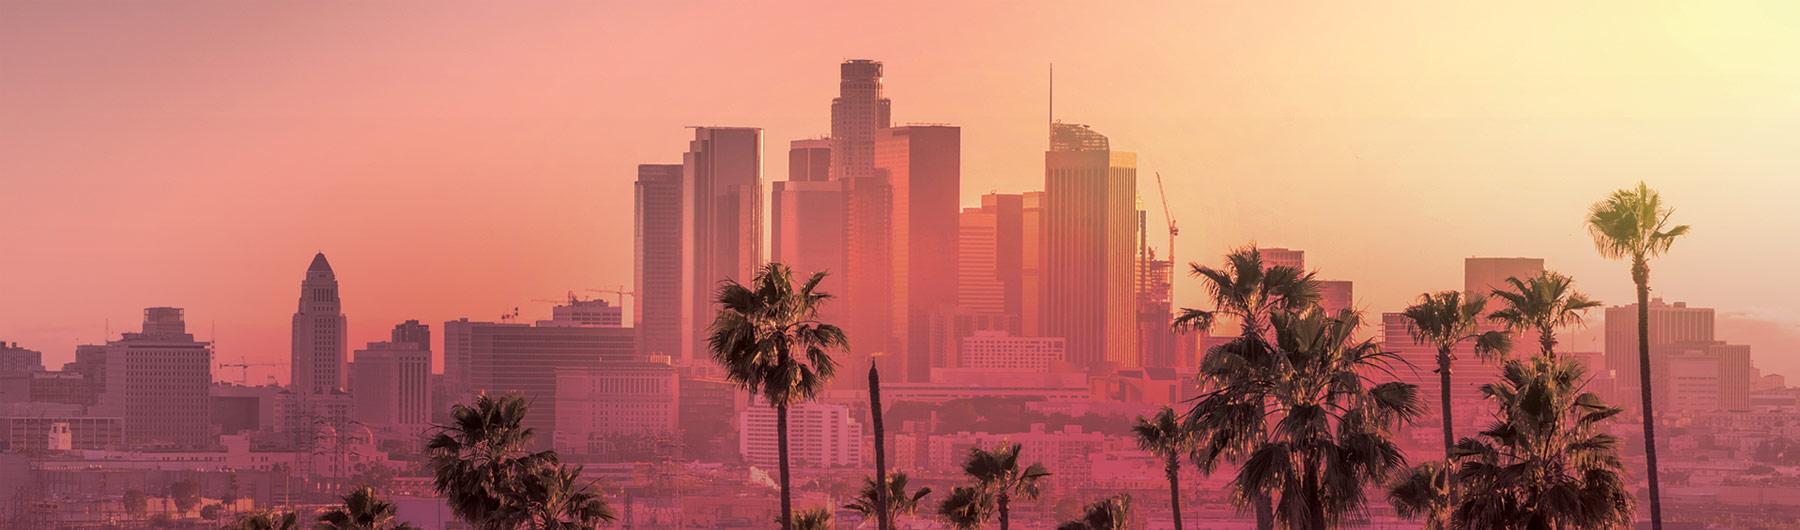 Unbelievable? Live in LA